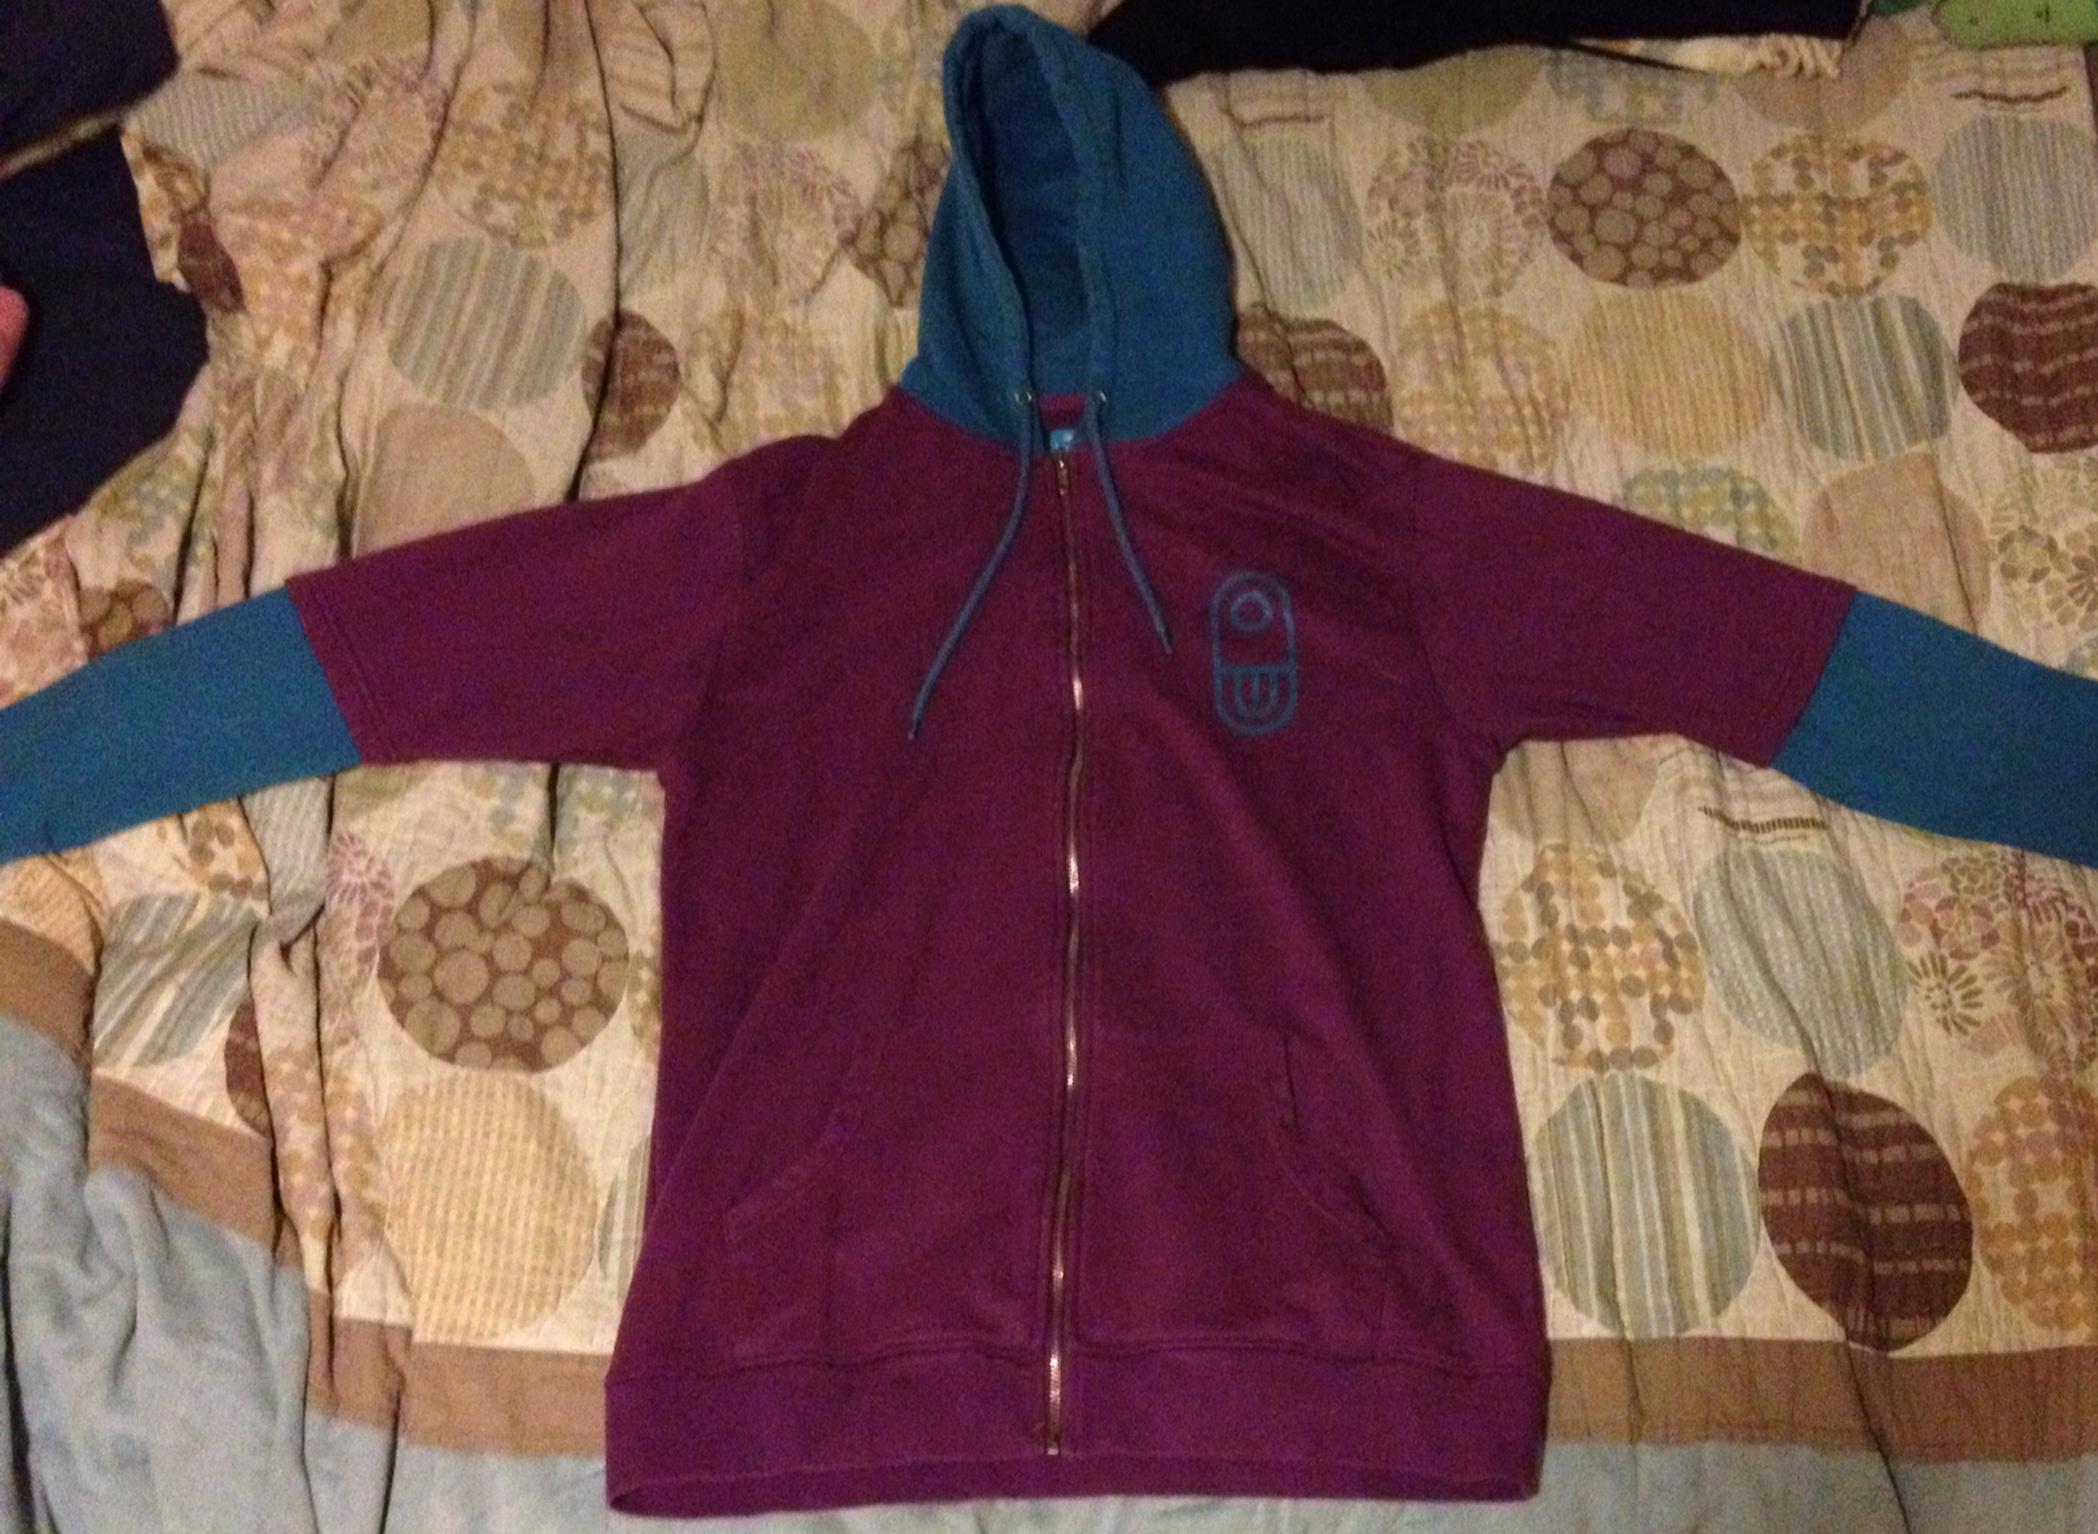 ns clothing 2